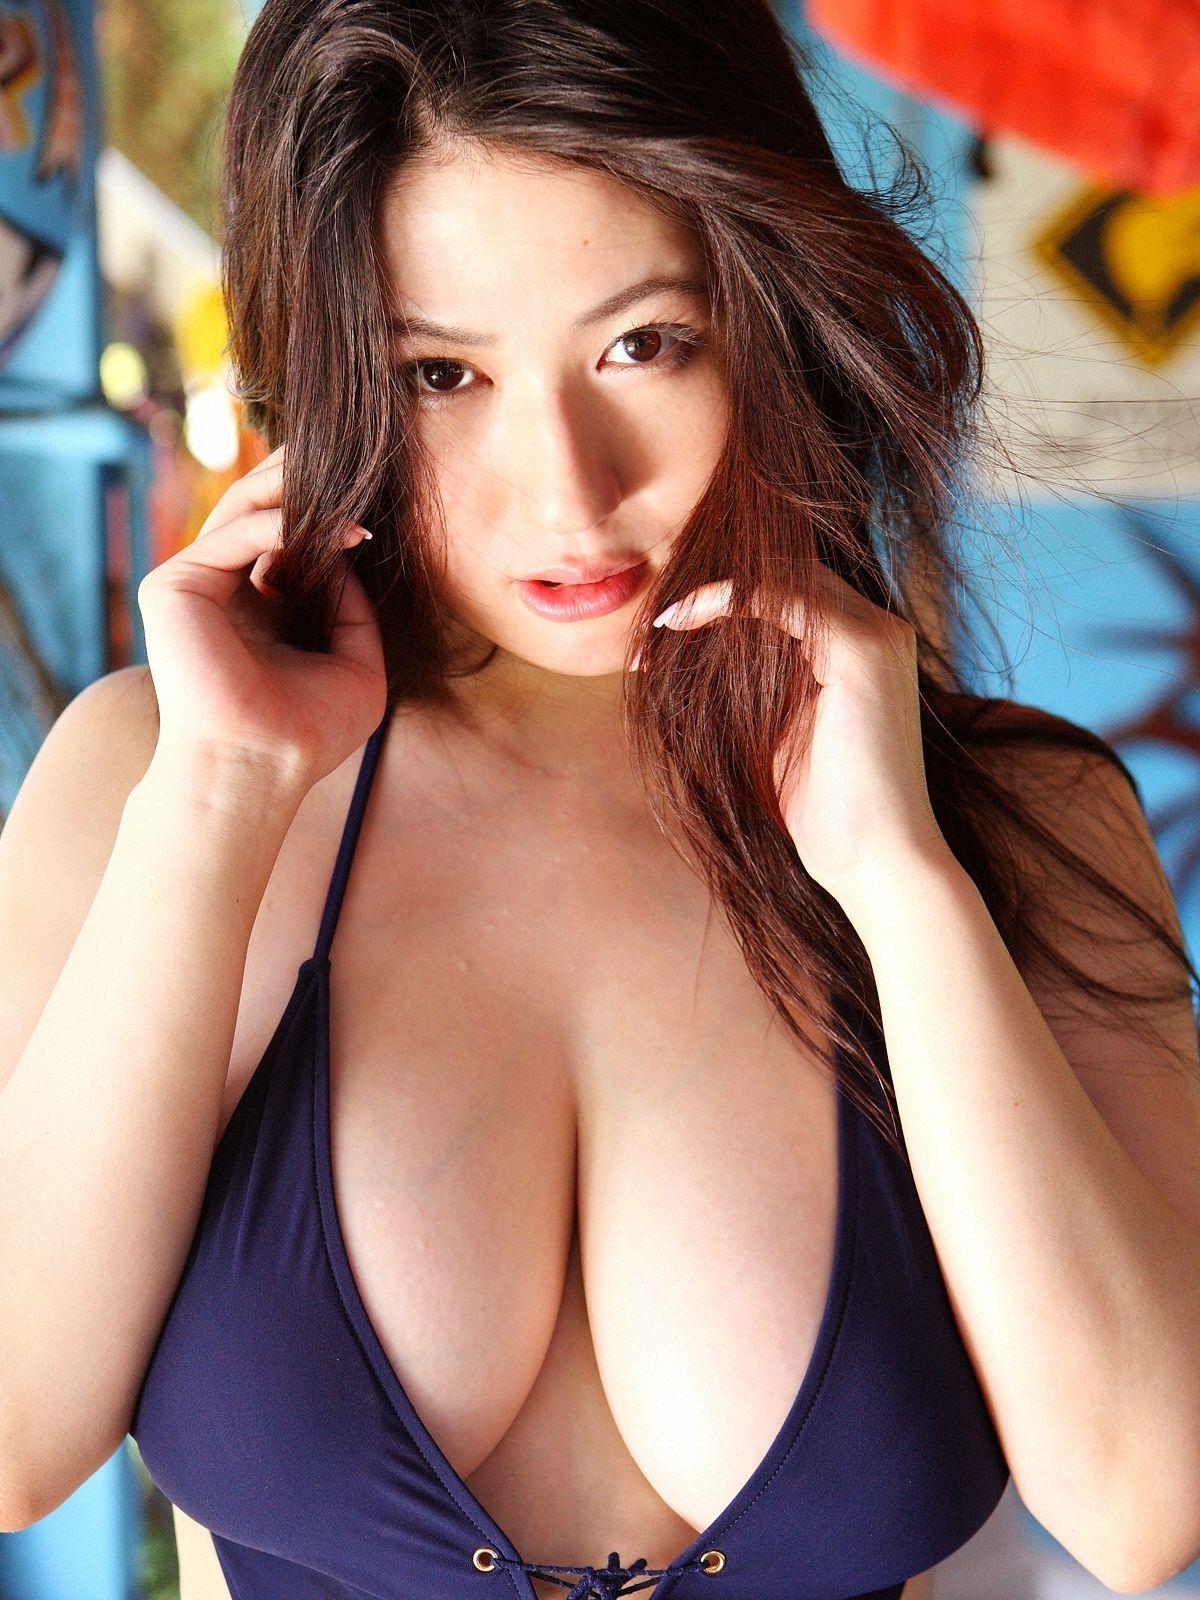 Nonami Takizawa (b. 1985) nude (51 photos), Ass, Paparazzi, Boobs, braless 2019